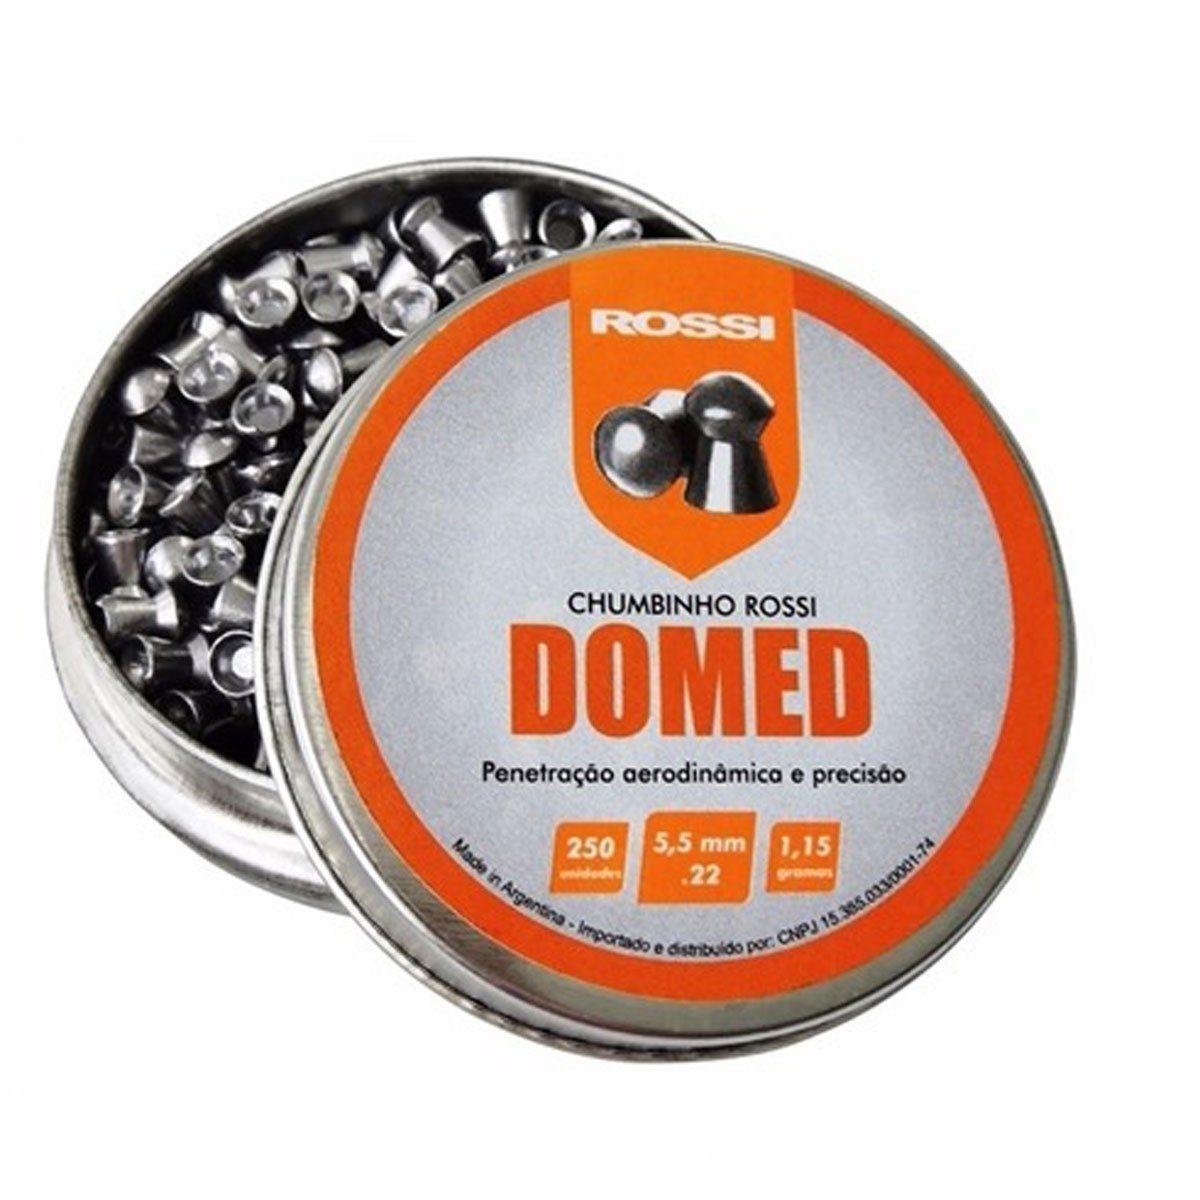 Chumbinho Rossi Domed 5,5mm 250 unidades